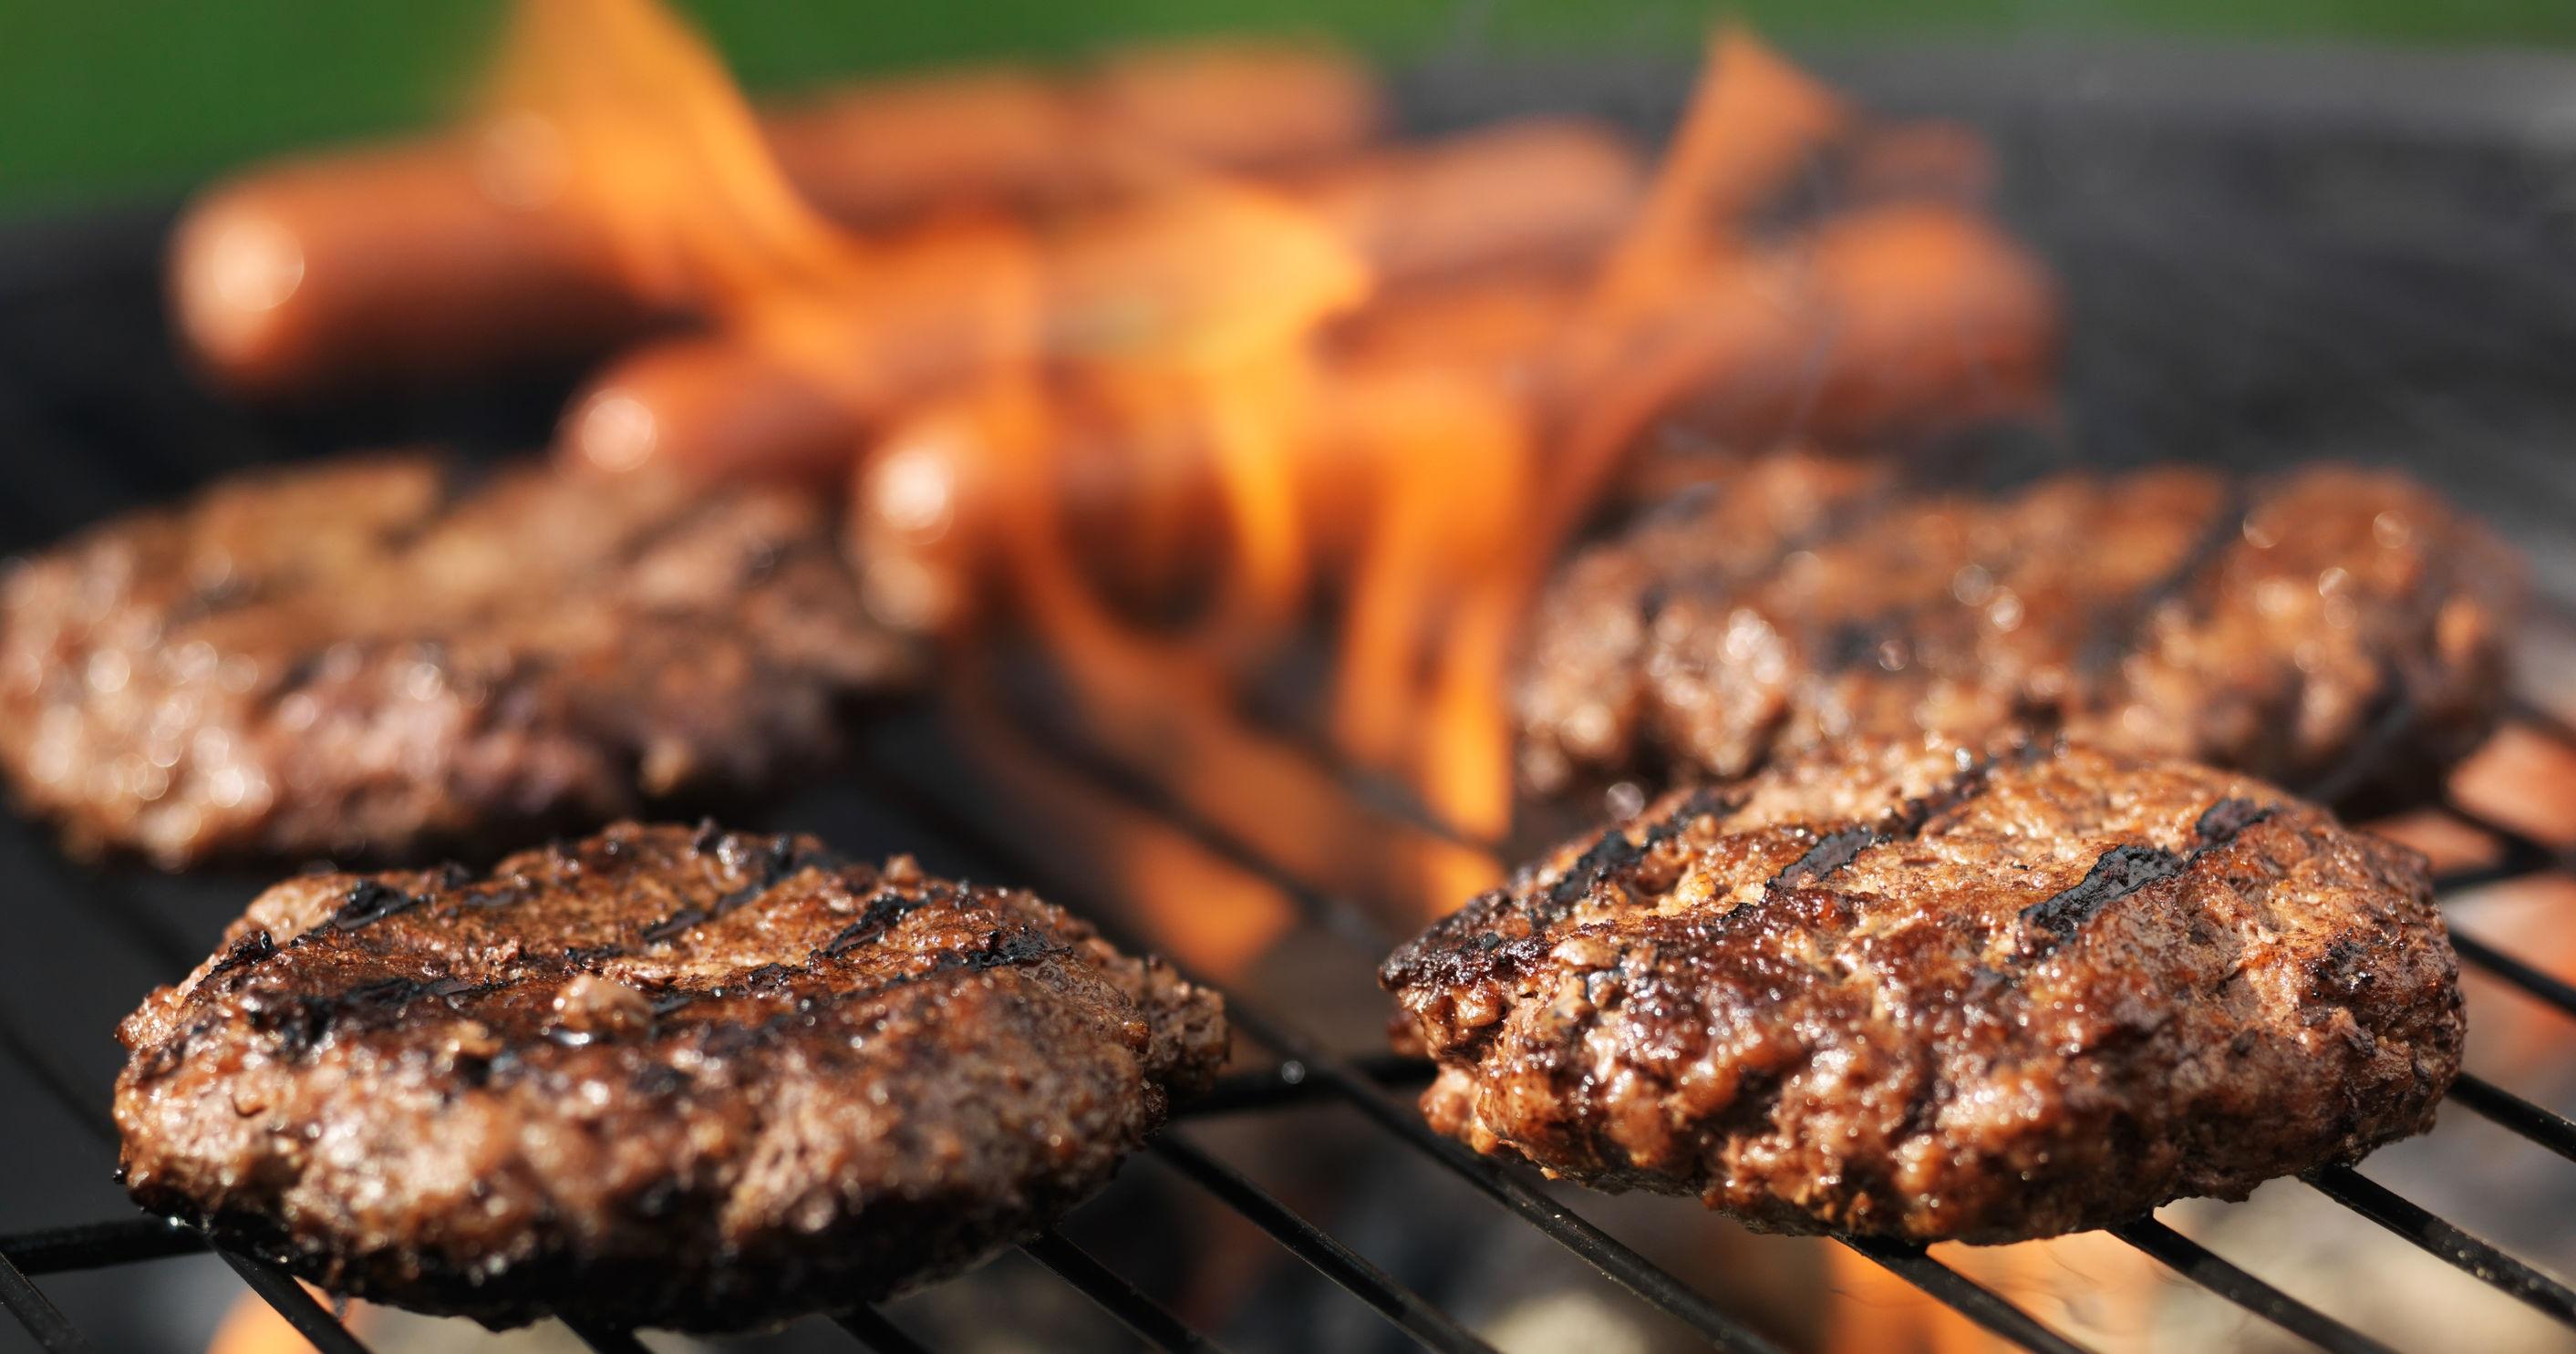 cookout cans quentes e hamburguesas na grella